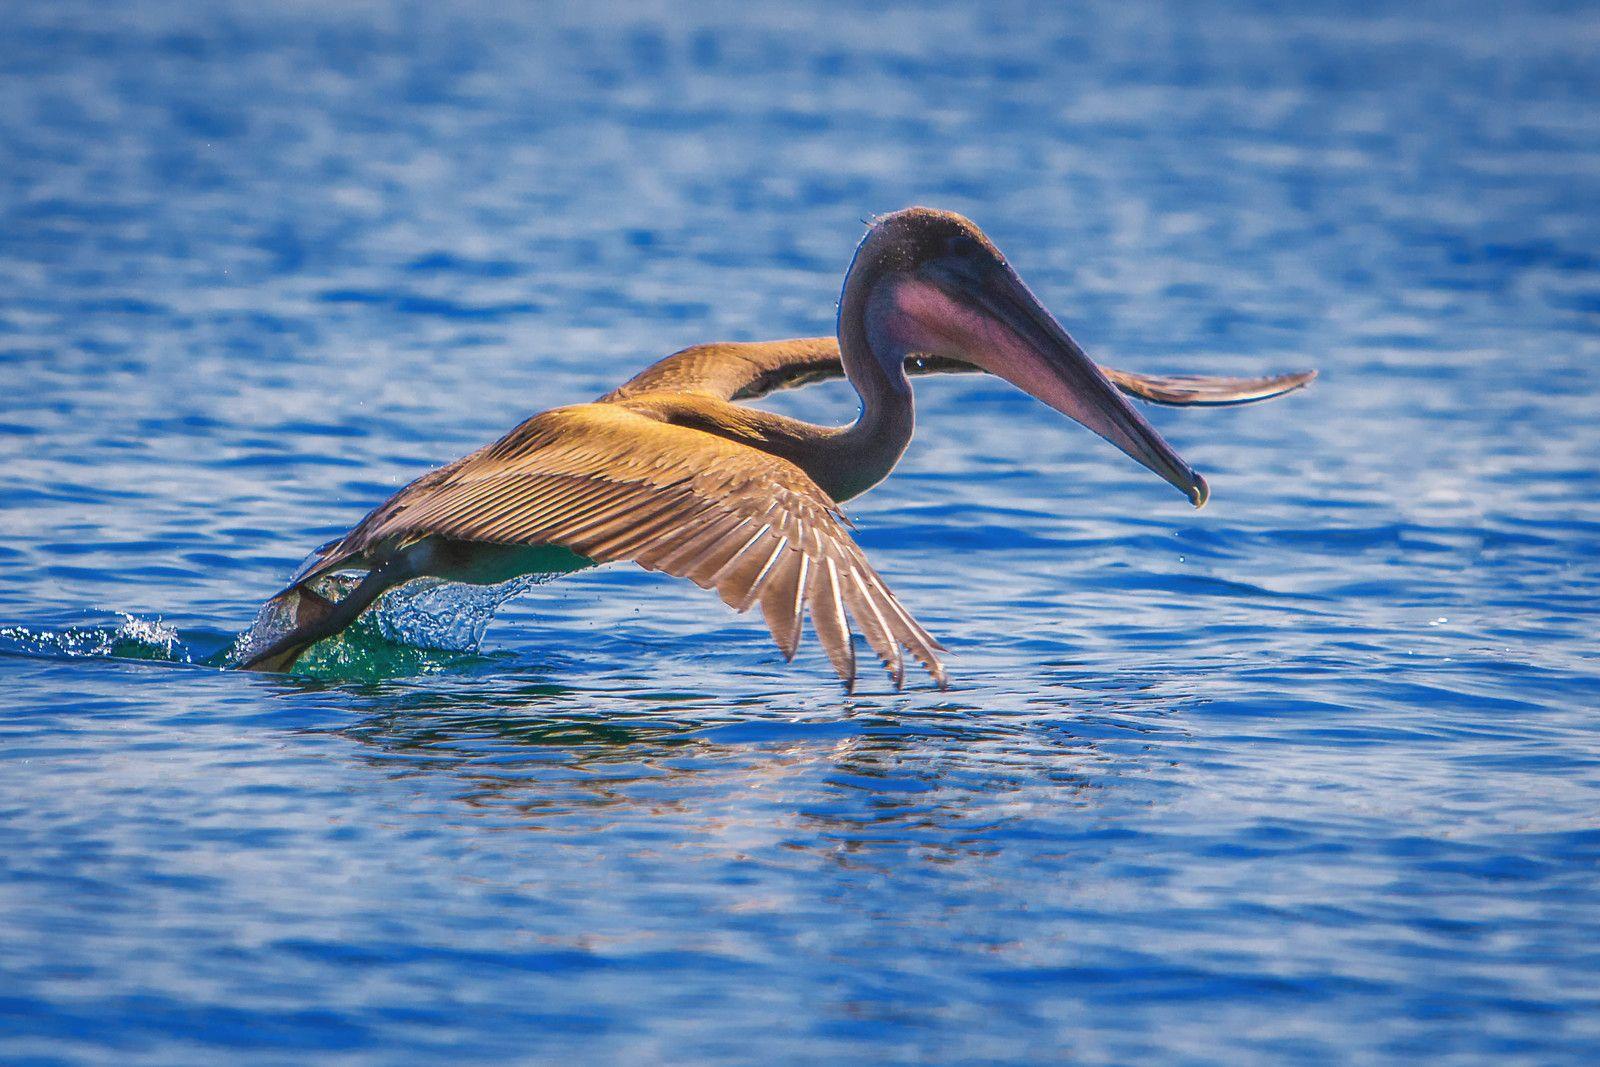 Wildlife of the Galapagos #photography #photooftheday #travel #travelphotography #traveling #wildlife #wildlifephotography #wildlifephotos #btpanimalpro #stunningmoment #stunningnature #youtube #video #travelvideo https://plus.google.com/+HaroldGardner/posts/jnnpBq53WPs